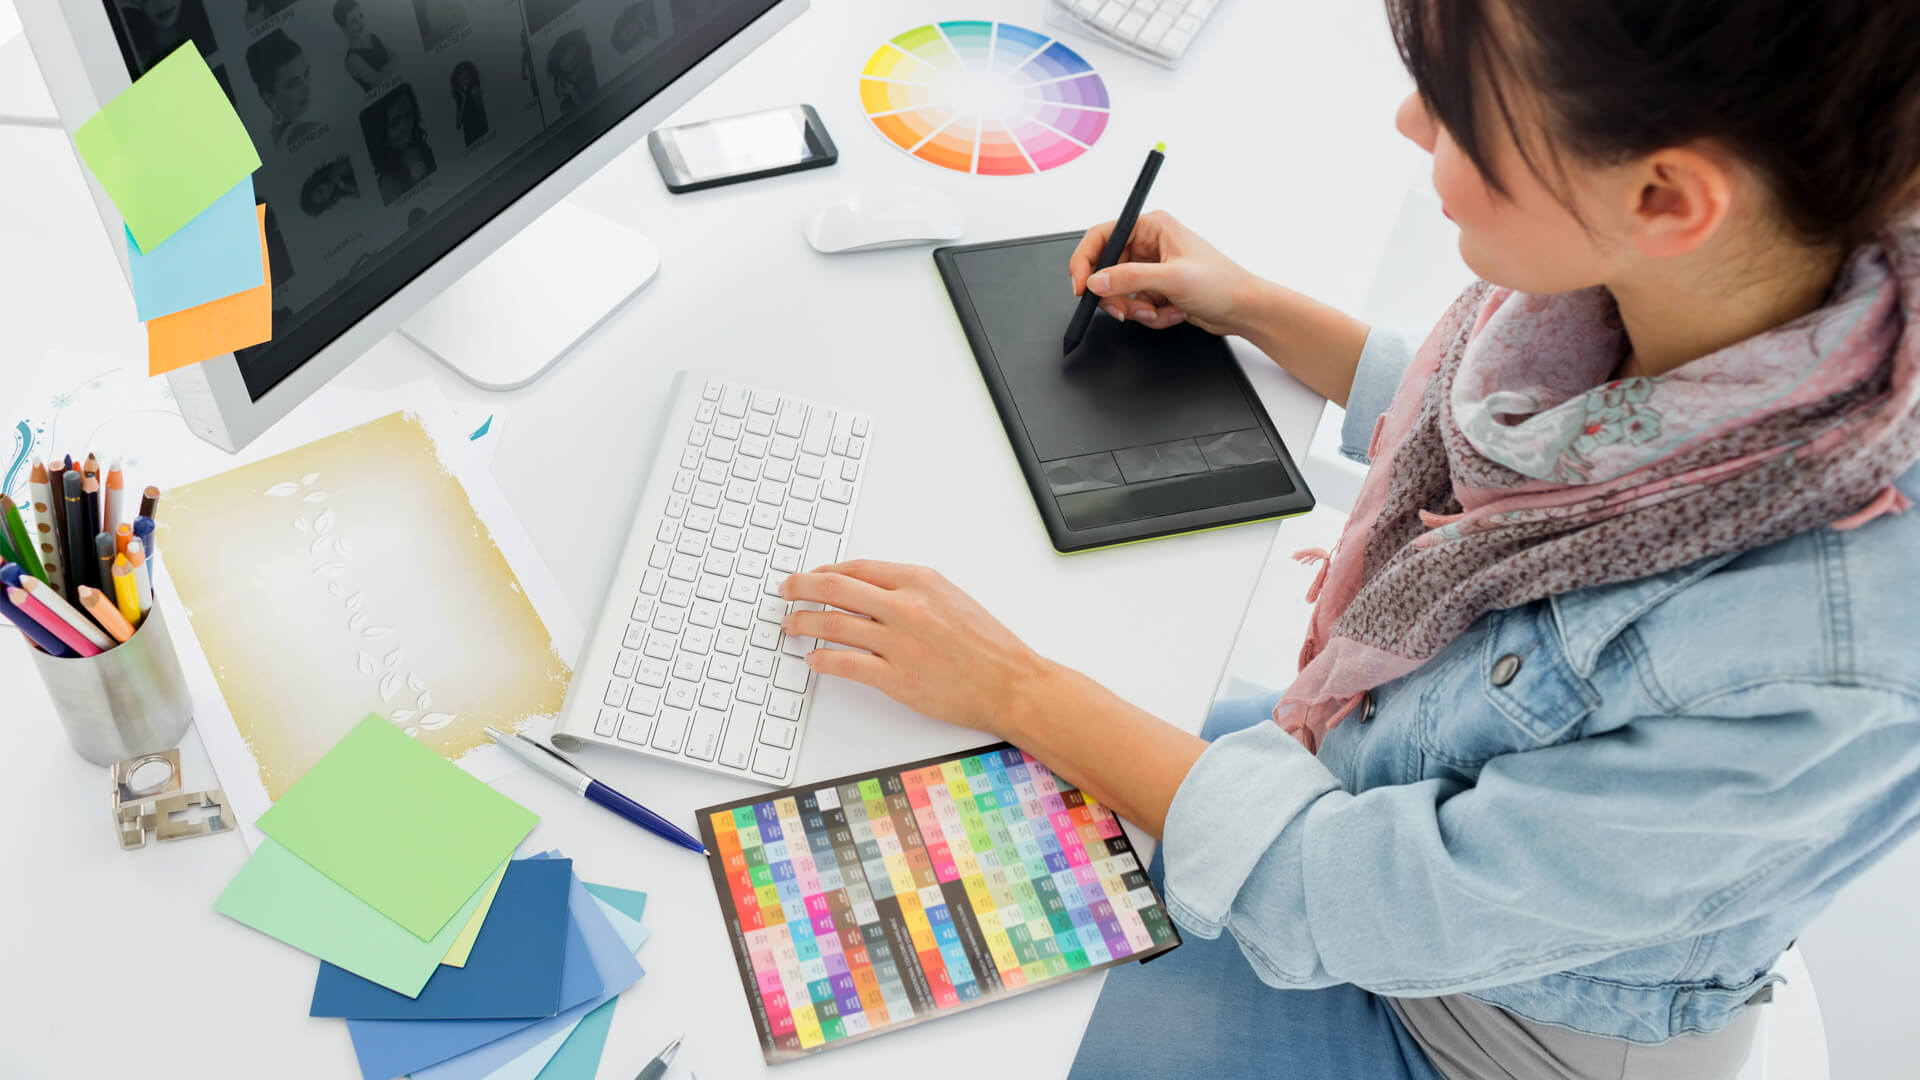 Дизайнеры москвы фриланс looking for freelancer